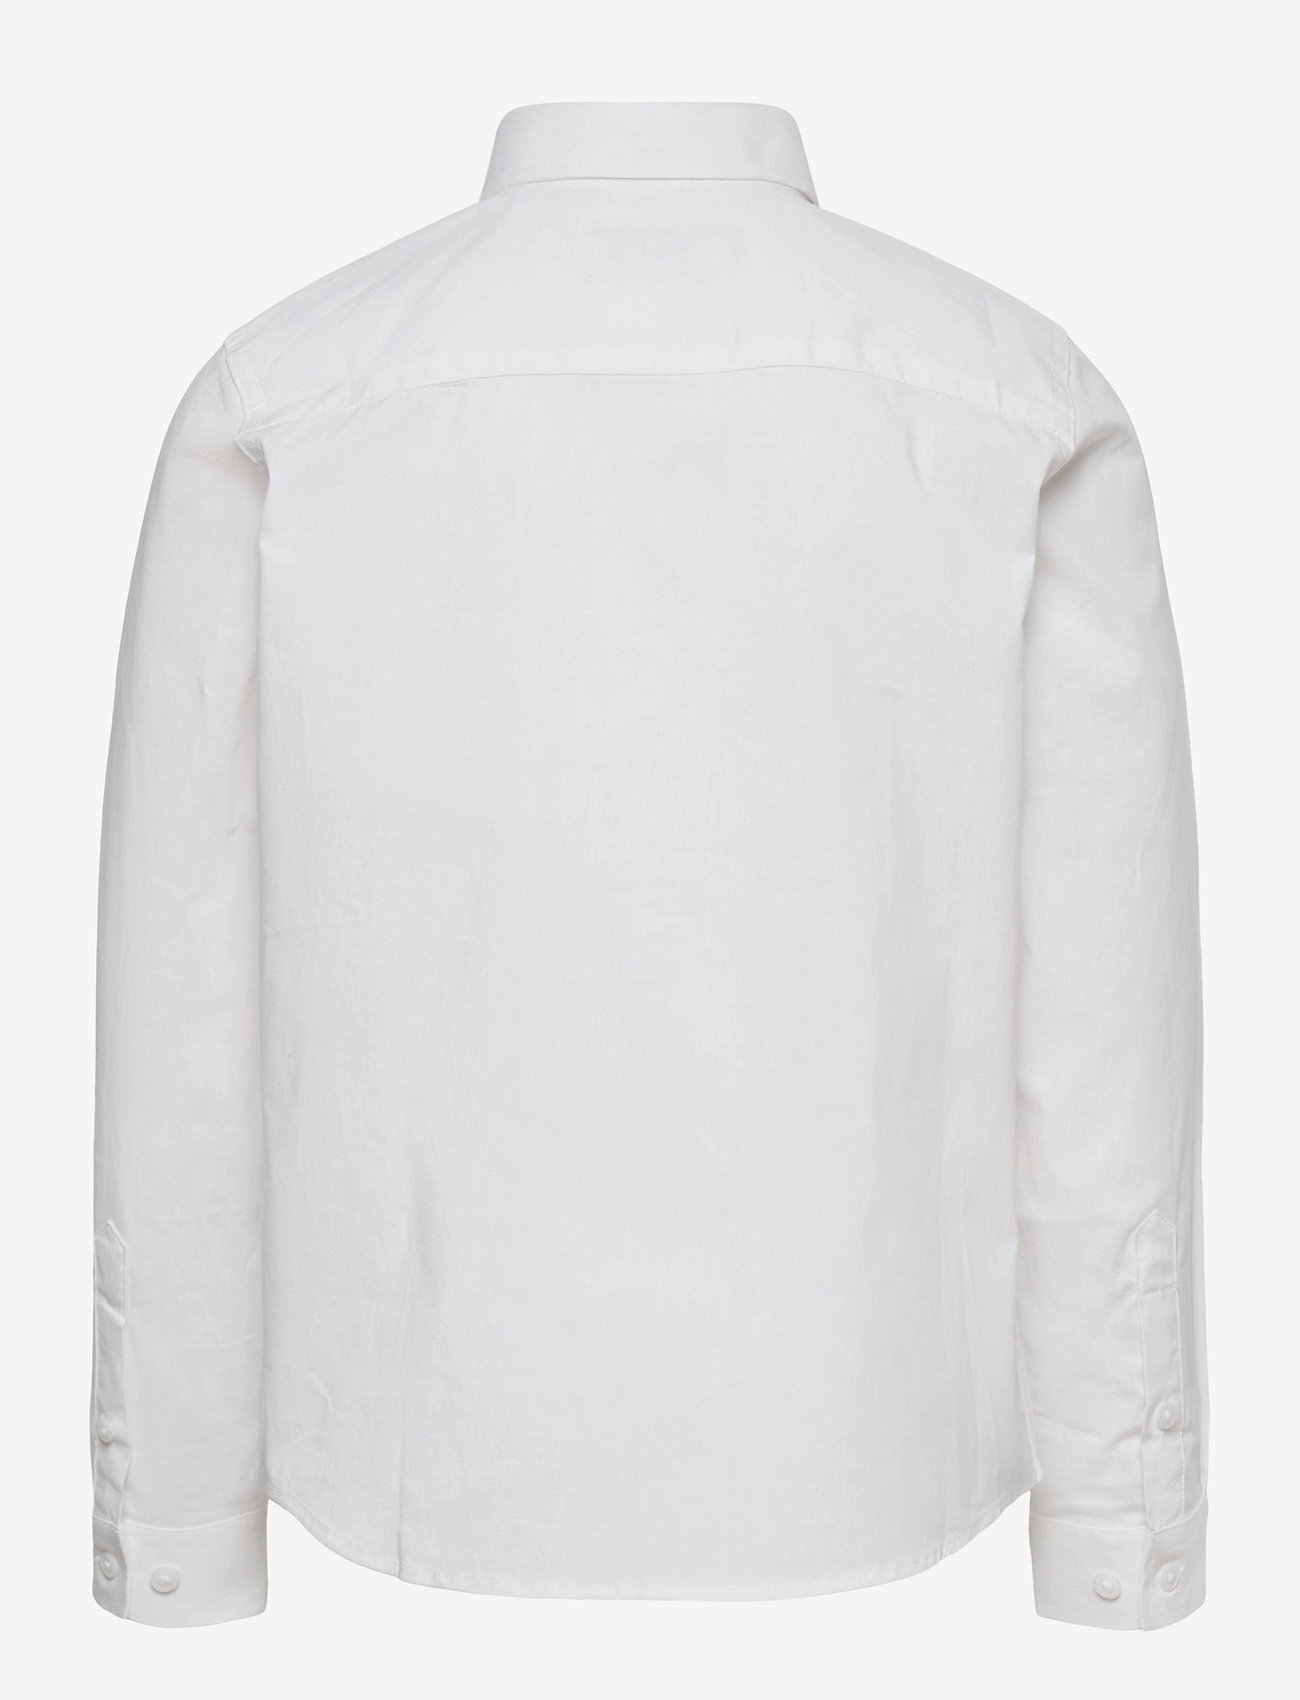 Jack & Jones - JJEMASON STRETCH SHIRT L/S ES21 JR - shirts - white - 1